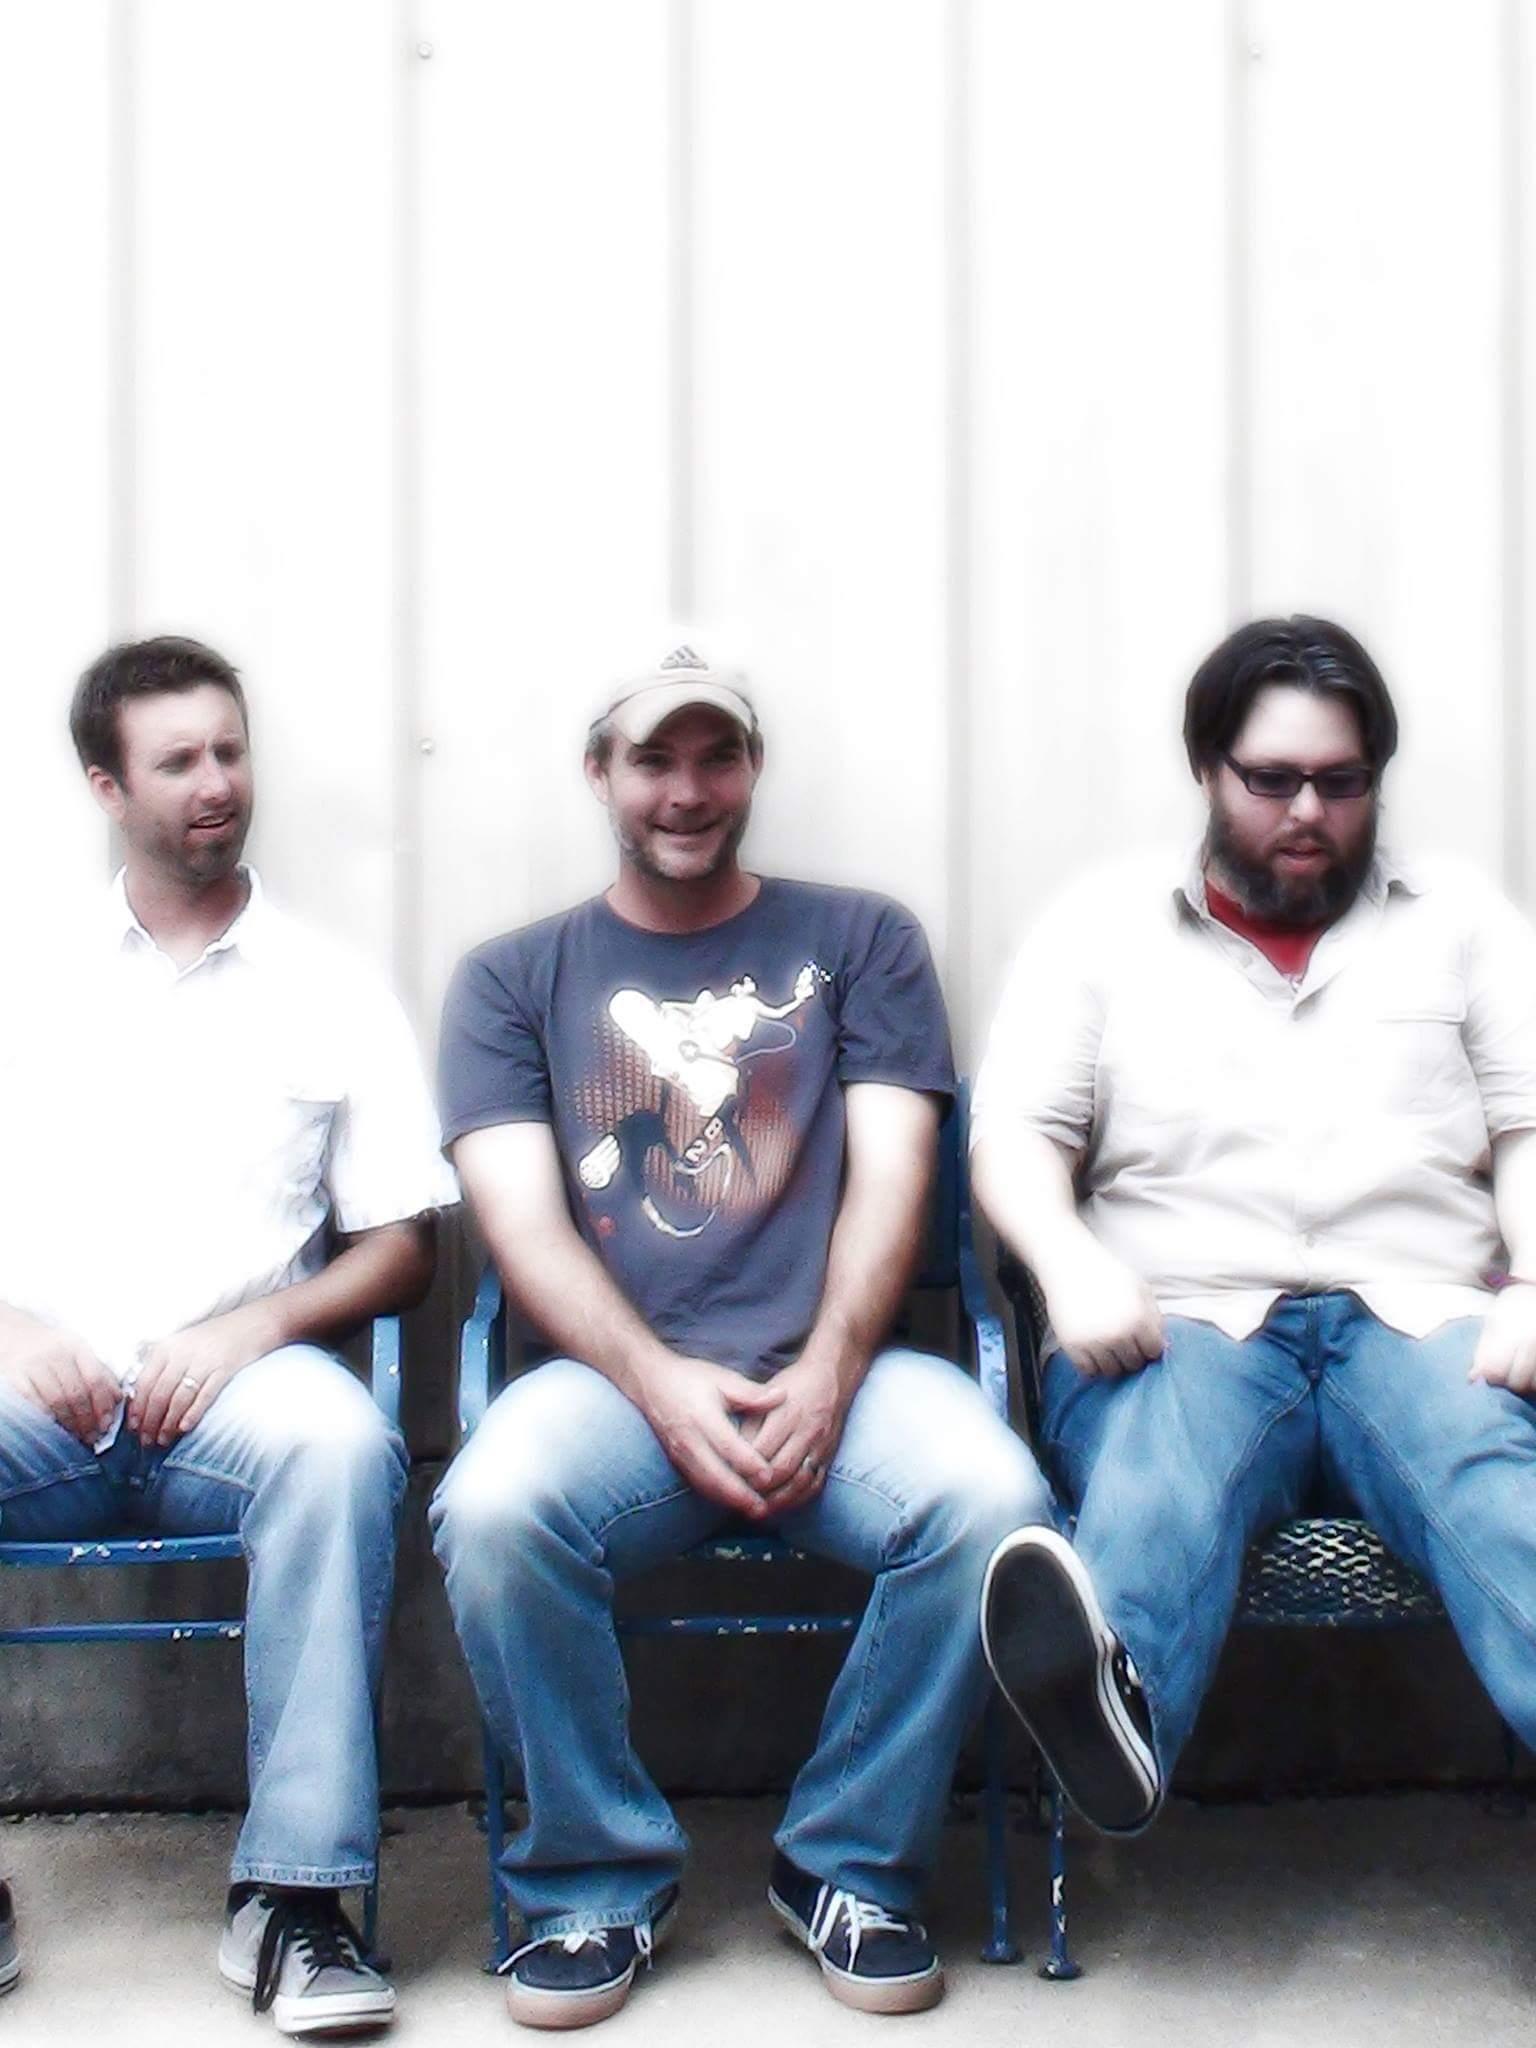 bandpic6.jpg